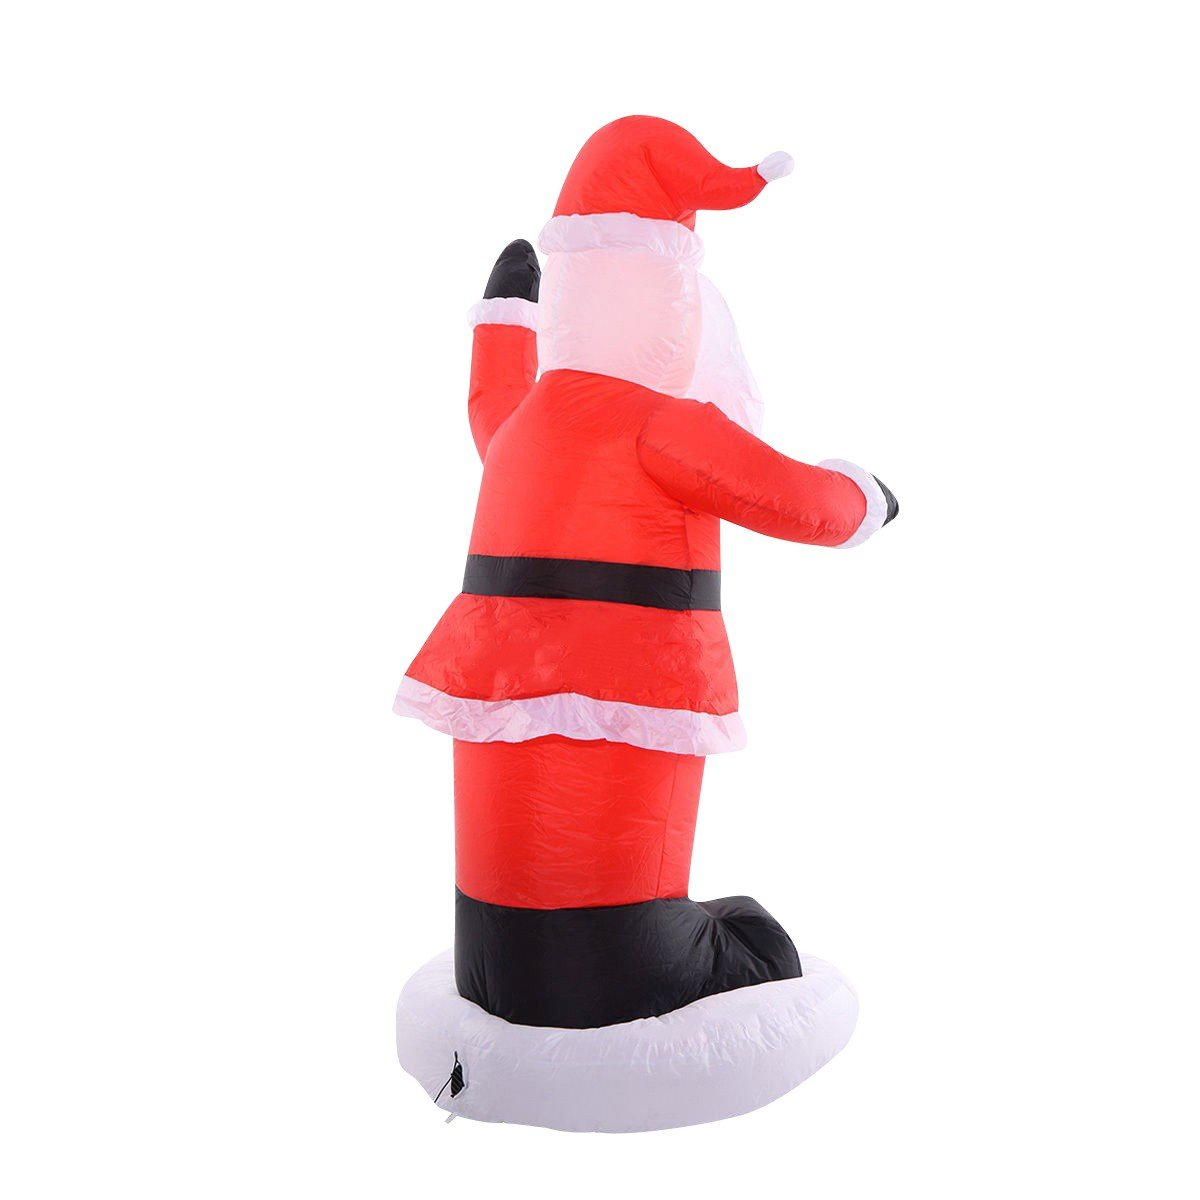 6 ft Airblown Inflatable Christmas Xmas Santa Claus Decoration ...